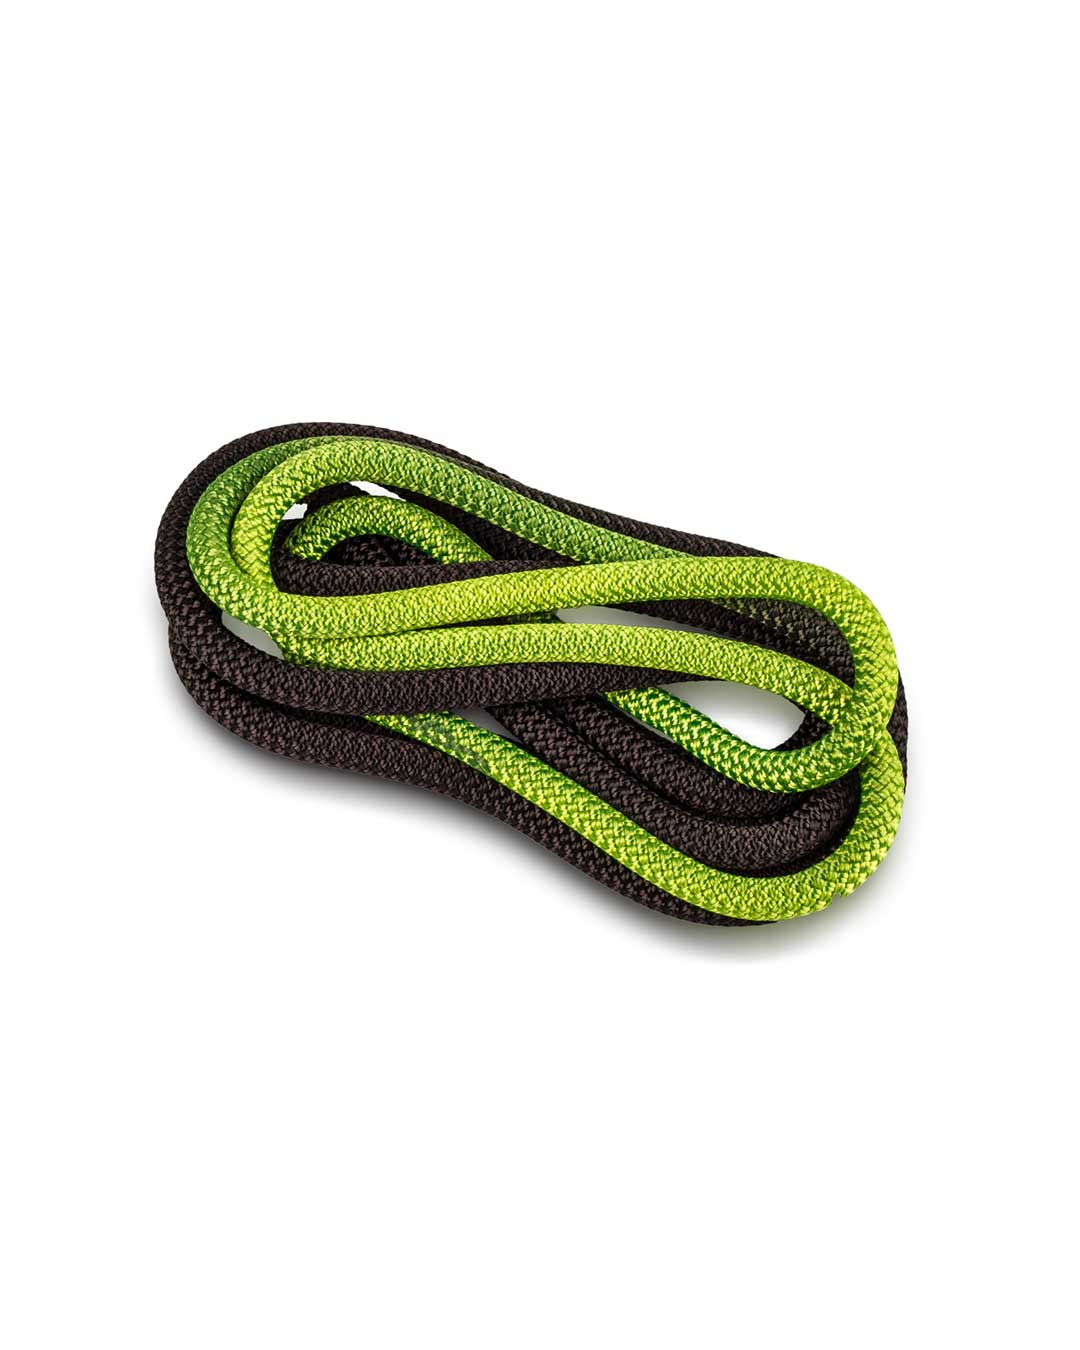 Cuerda de gimnasia rítmica VENTURELLI (Certificada FIG) verde negro - 3 m